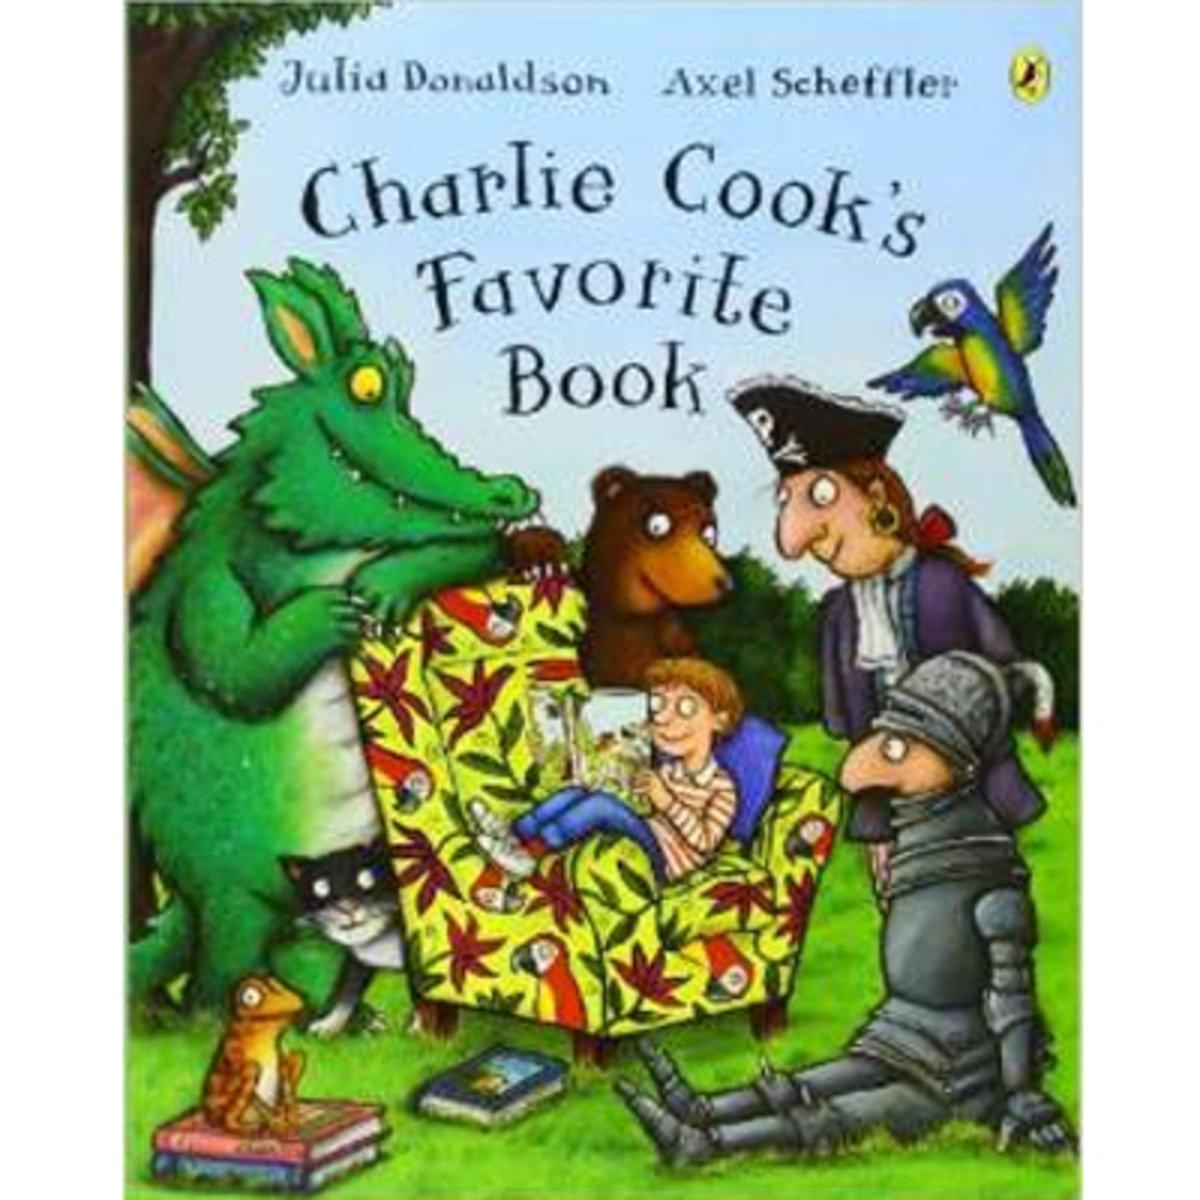 CHARLIE COOK'S FAVORITE BOOK 9780142411384